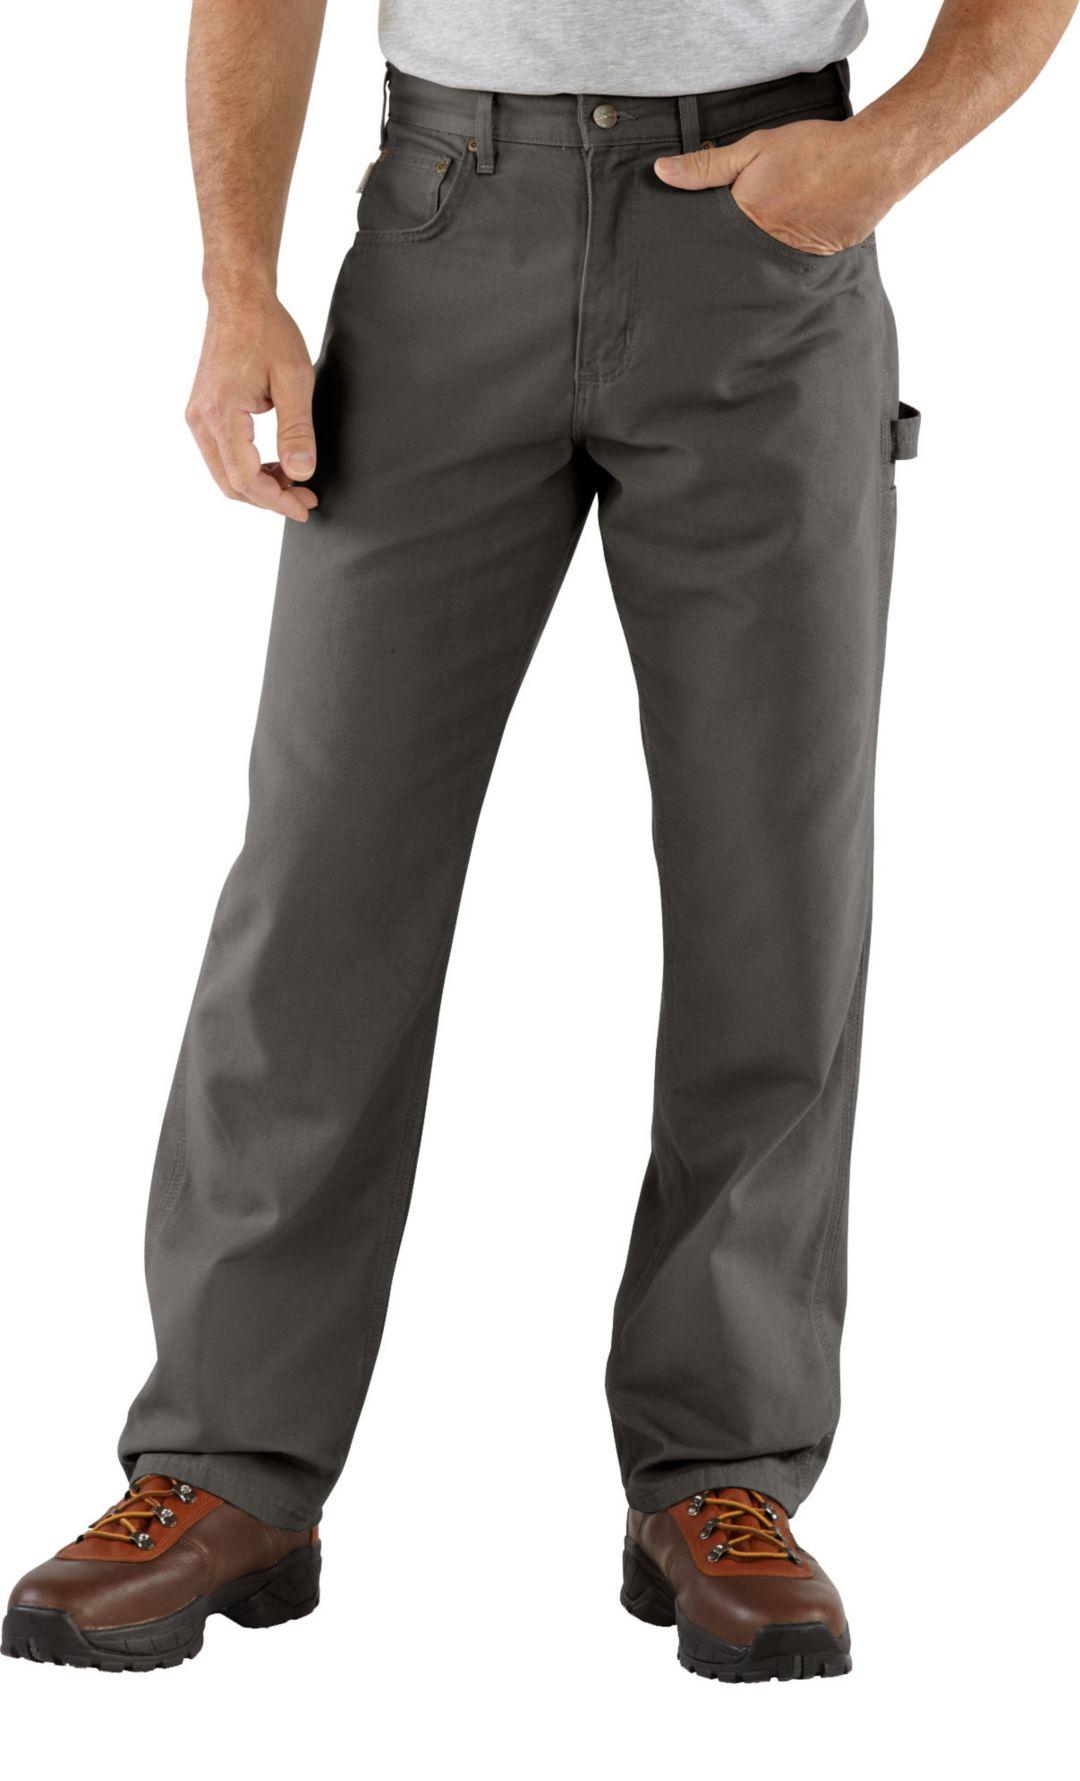 95b3e475bc Carhartt Men's Canvas Carpenter Jeans | DICK'S Sporting Goods